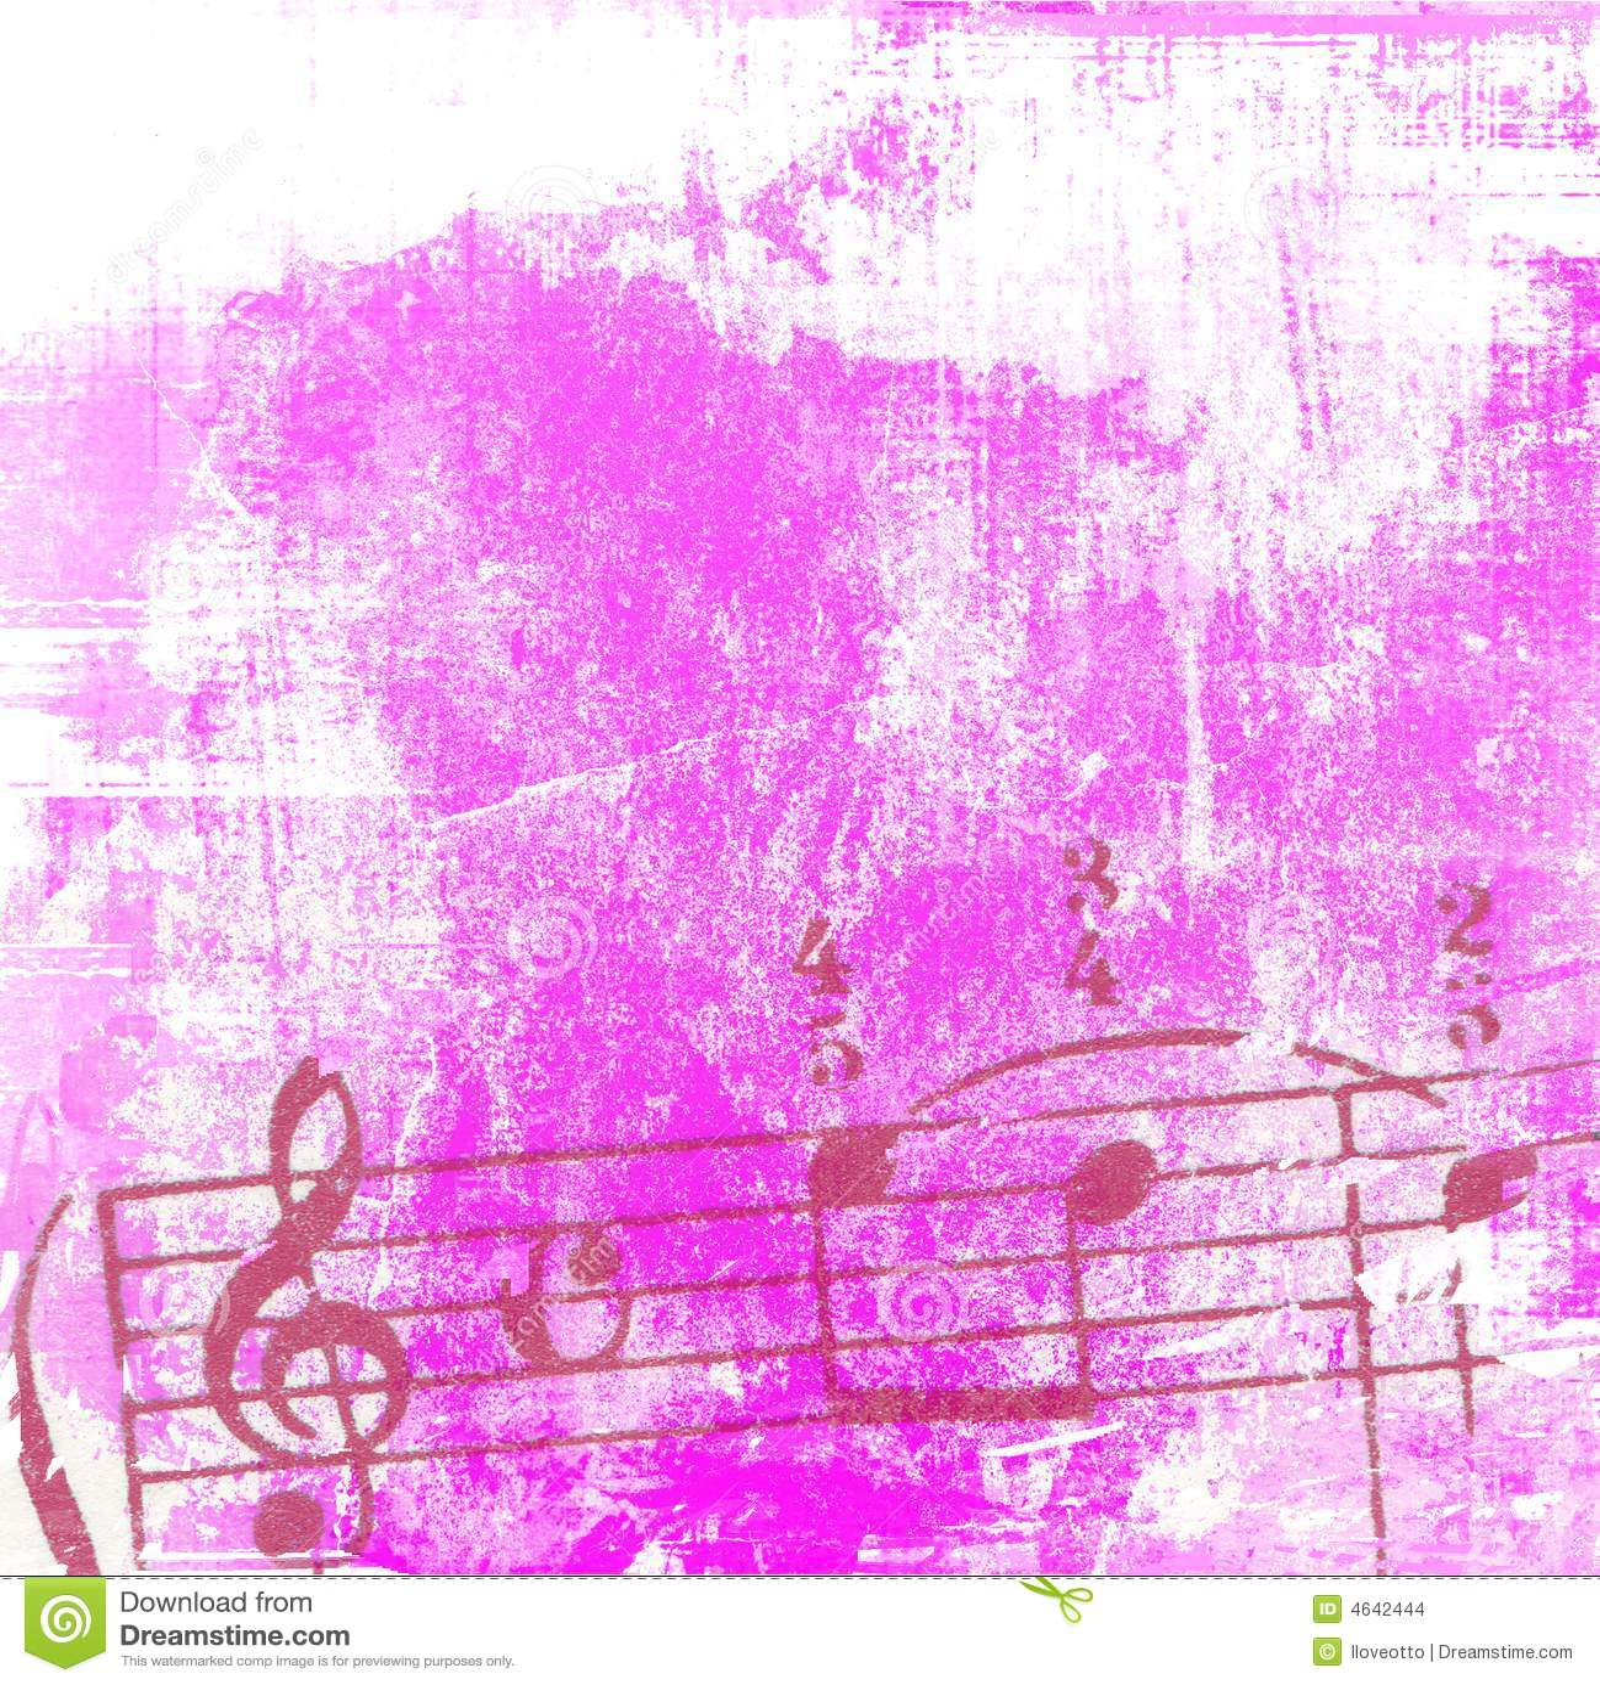 Texturas e fundos da música de Grunge